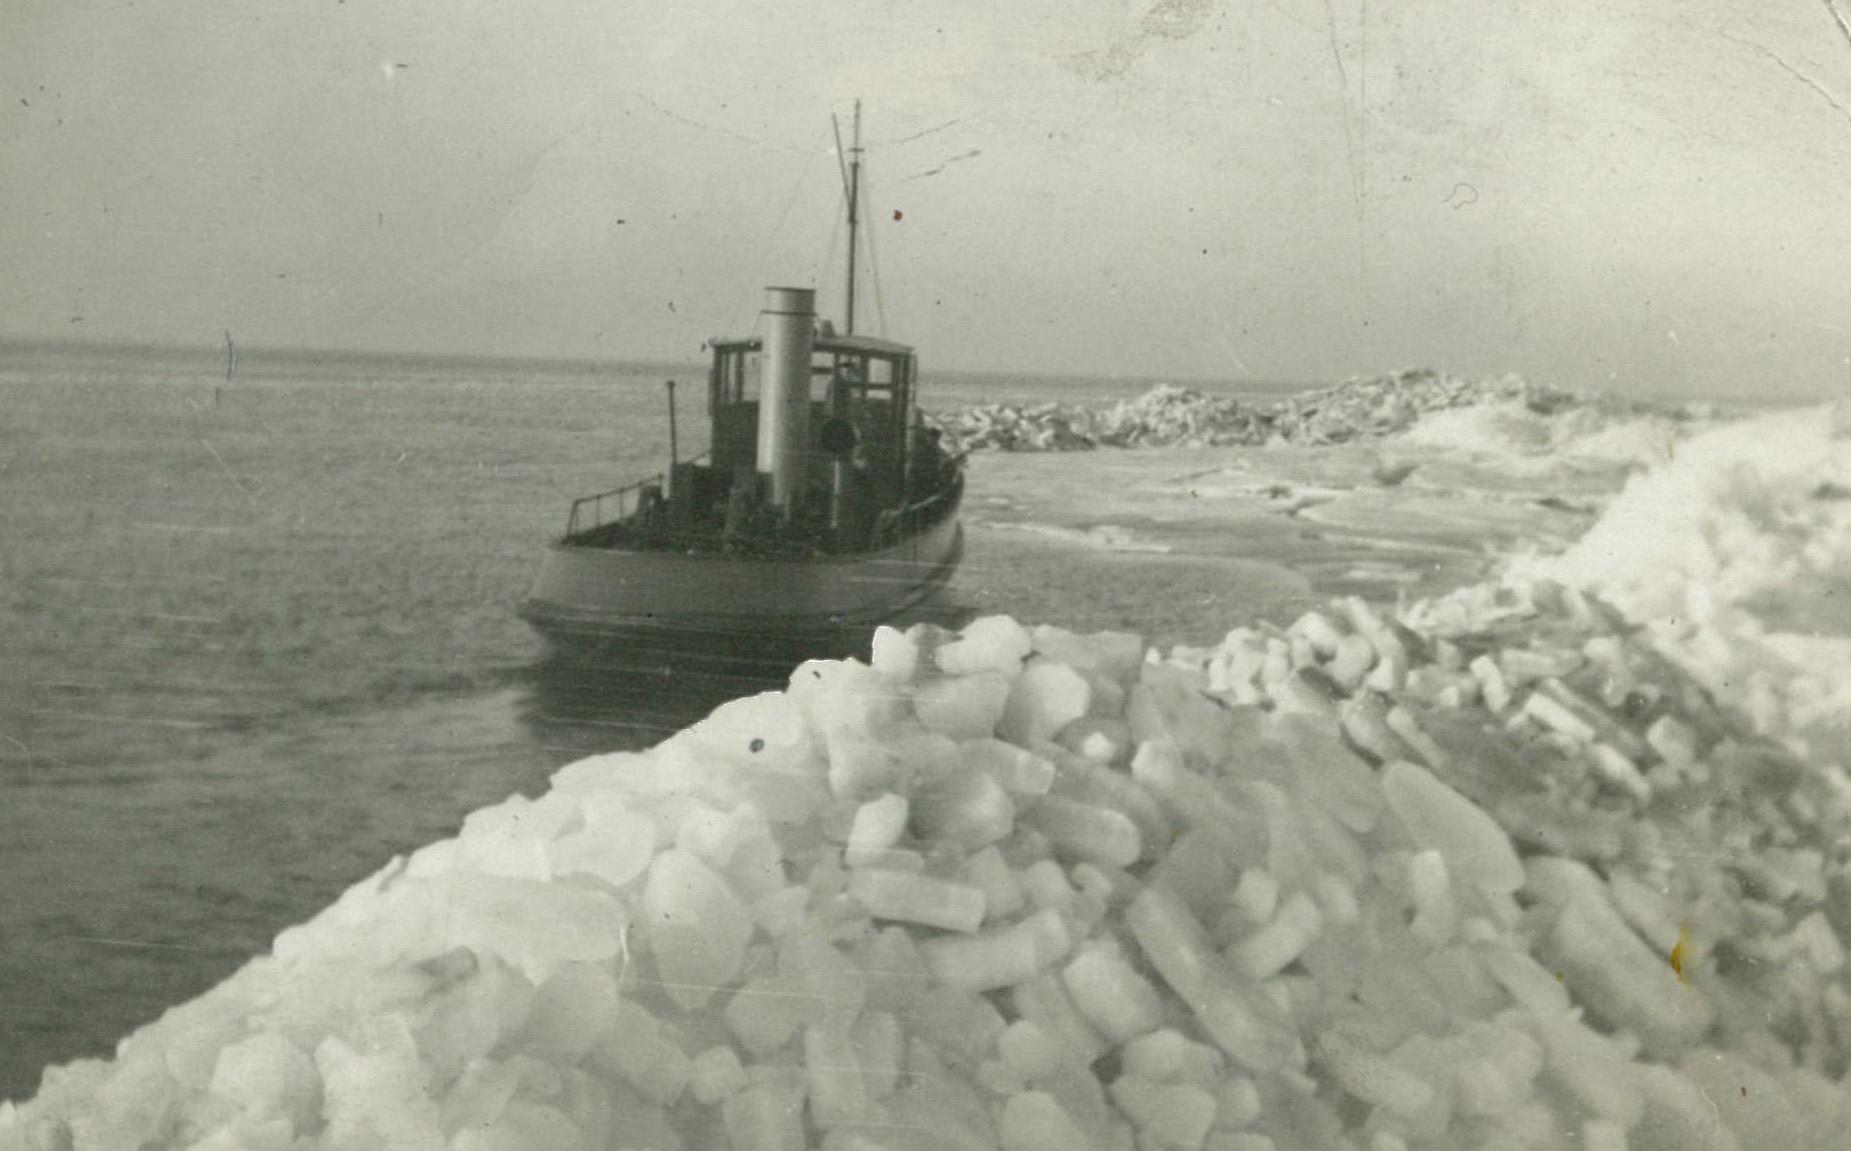 Pampus, toen er nog échte winters waren Foto: Stichting Pampus